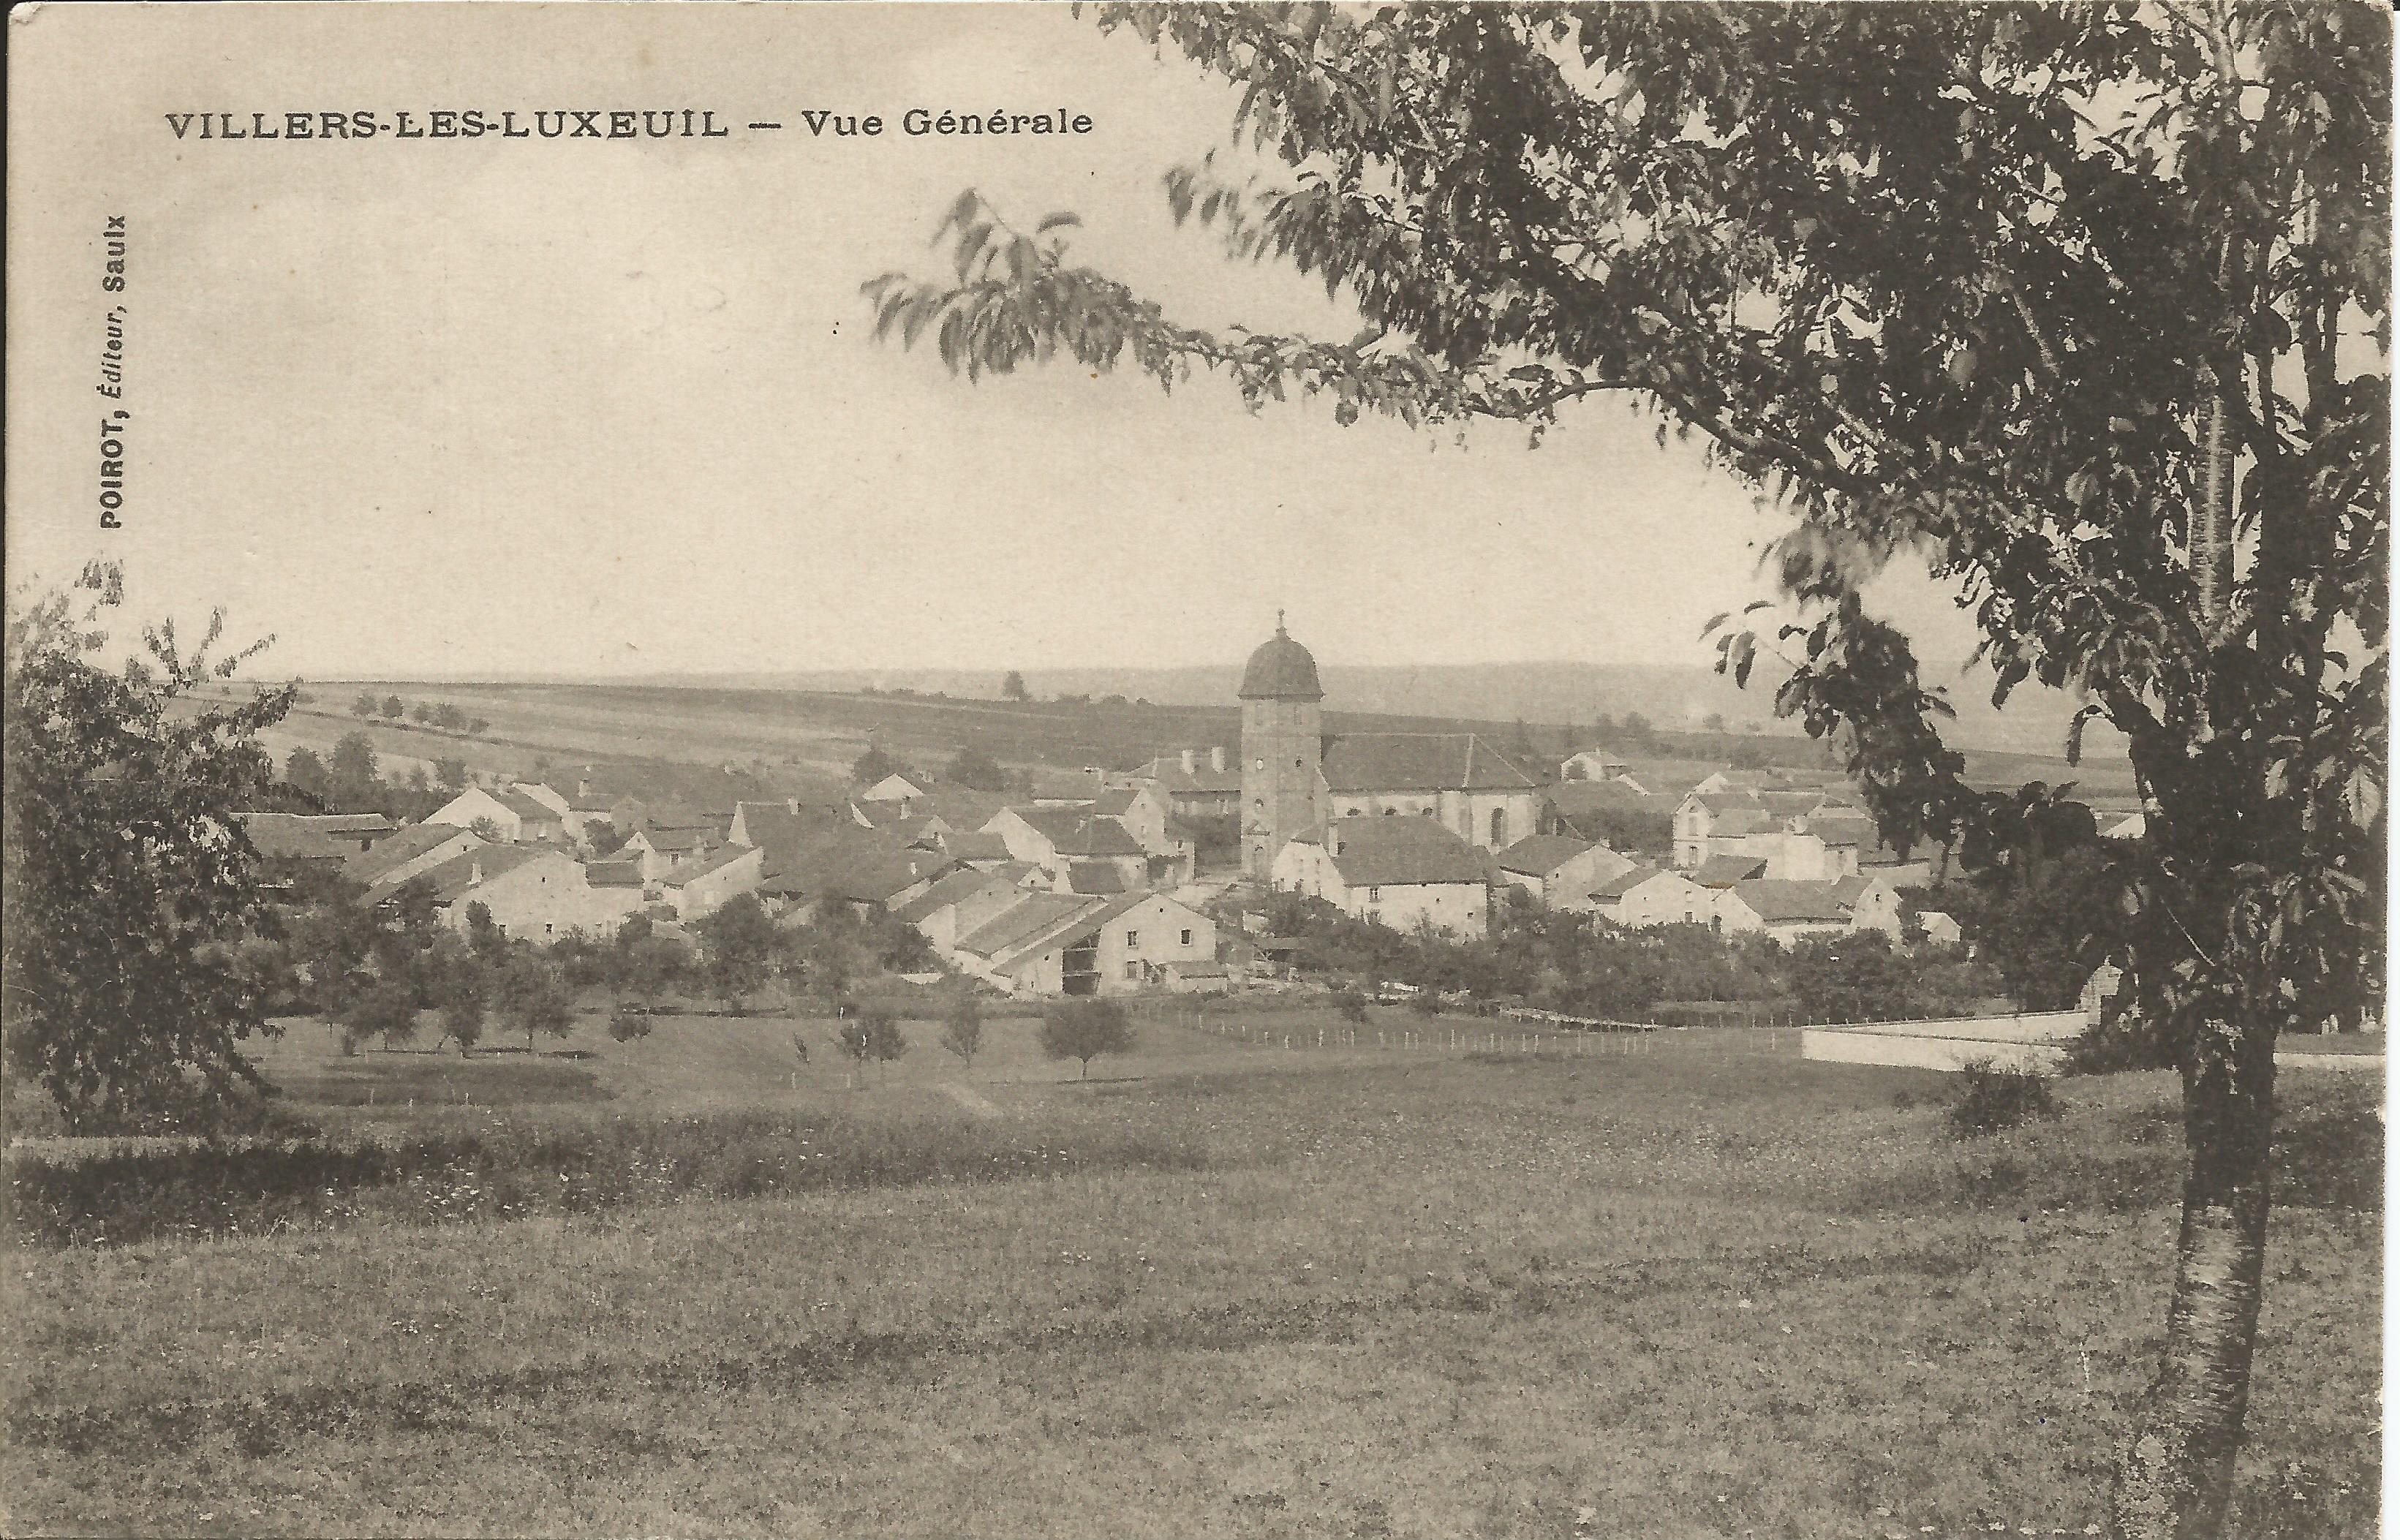 https://www.villers-les-luxeuil.com/projets/villers/files/images/Cartes_postales/General_2015/Vue_Generale_9_1912.jpg